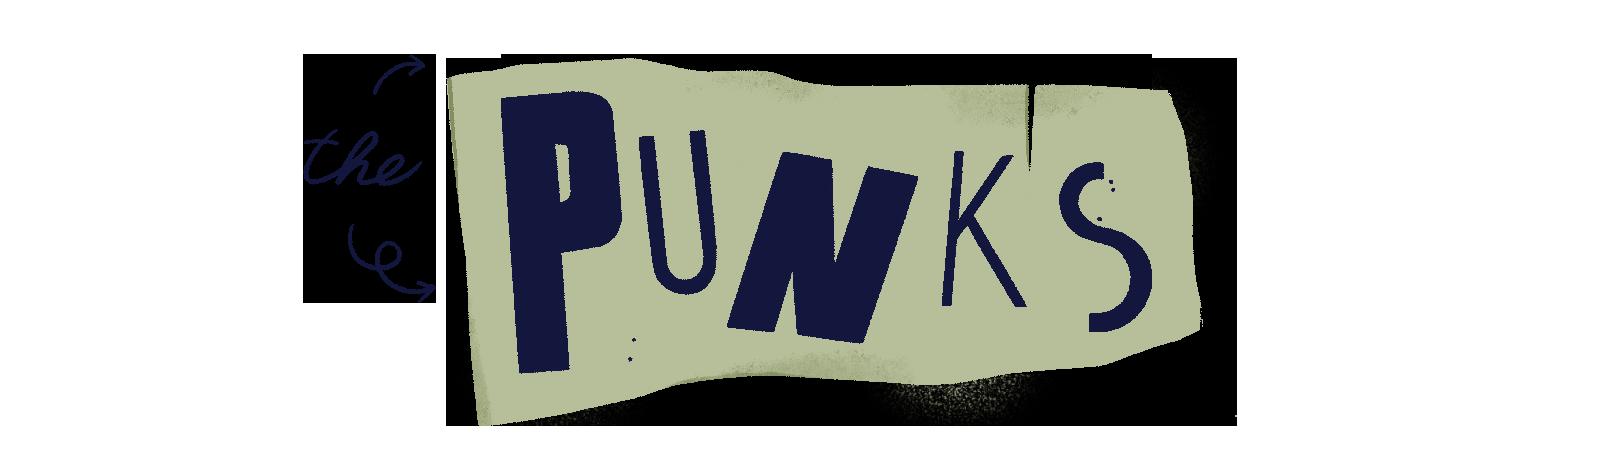 Illustration of the word 'punks